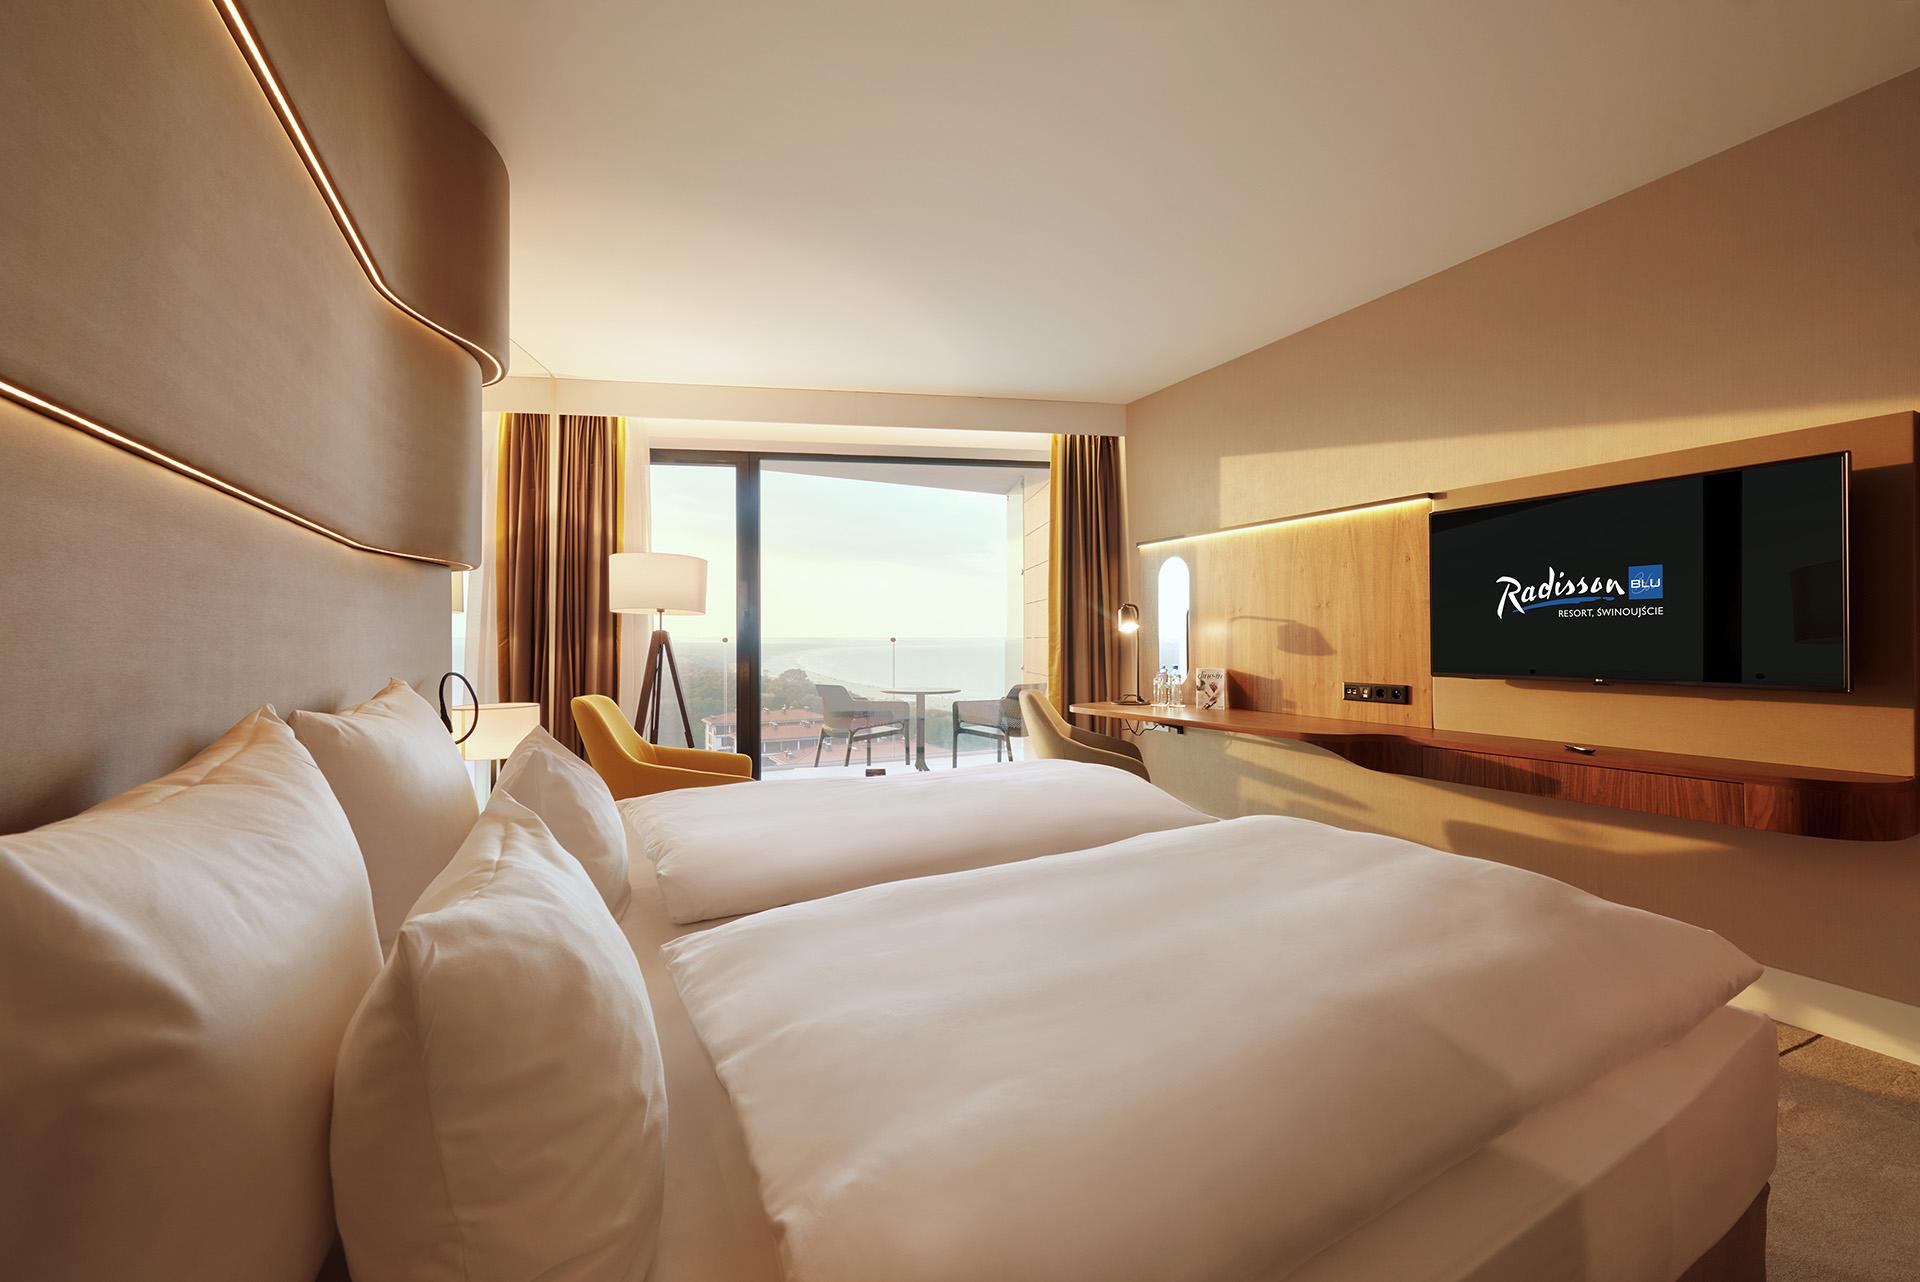 Hotel Radisson Blu Resort Swinoujscie